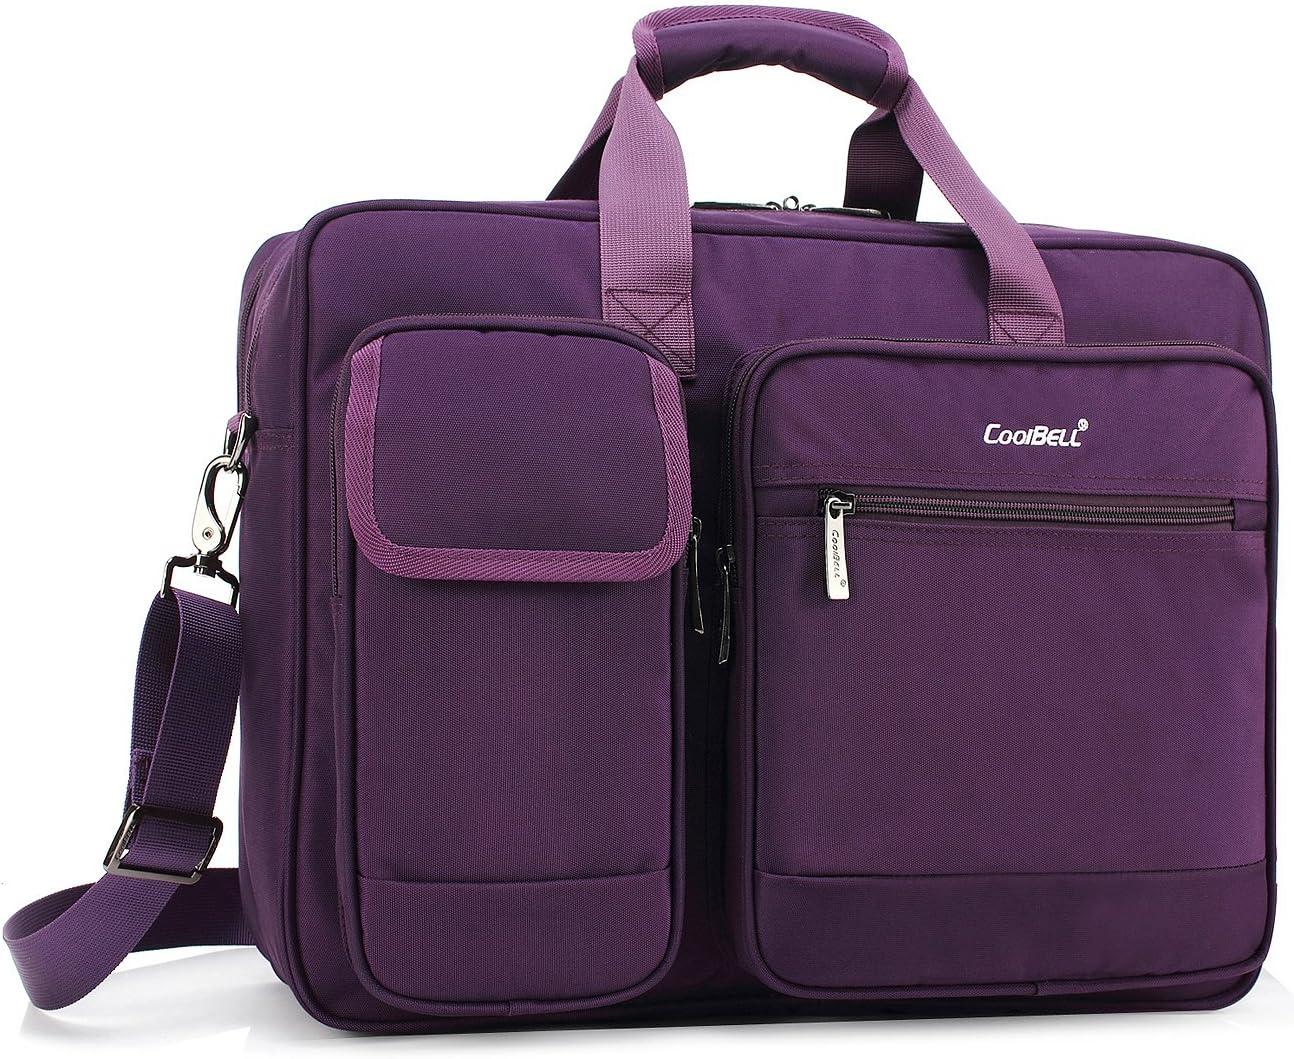 CoolBELL 15.6 Inch Laptop Briefcase Protective Messenger Bag Nylon Shoulder Bag Multi-Functional Hand Bag for Laptop/Ultrabook/Tablet/MacBook/Dell/HP/Men/Women/Business (Purple)